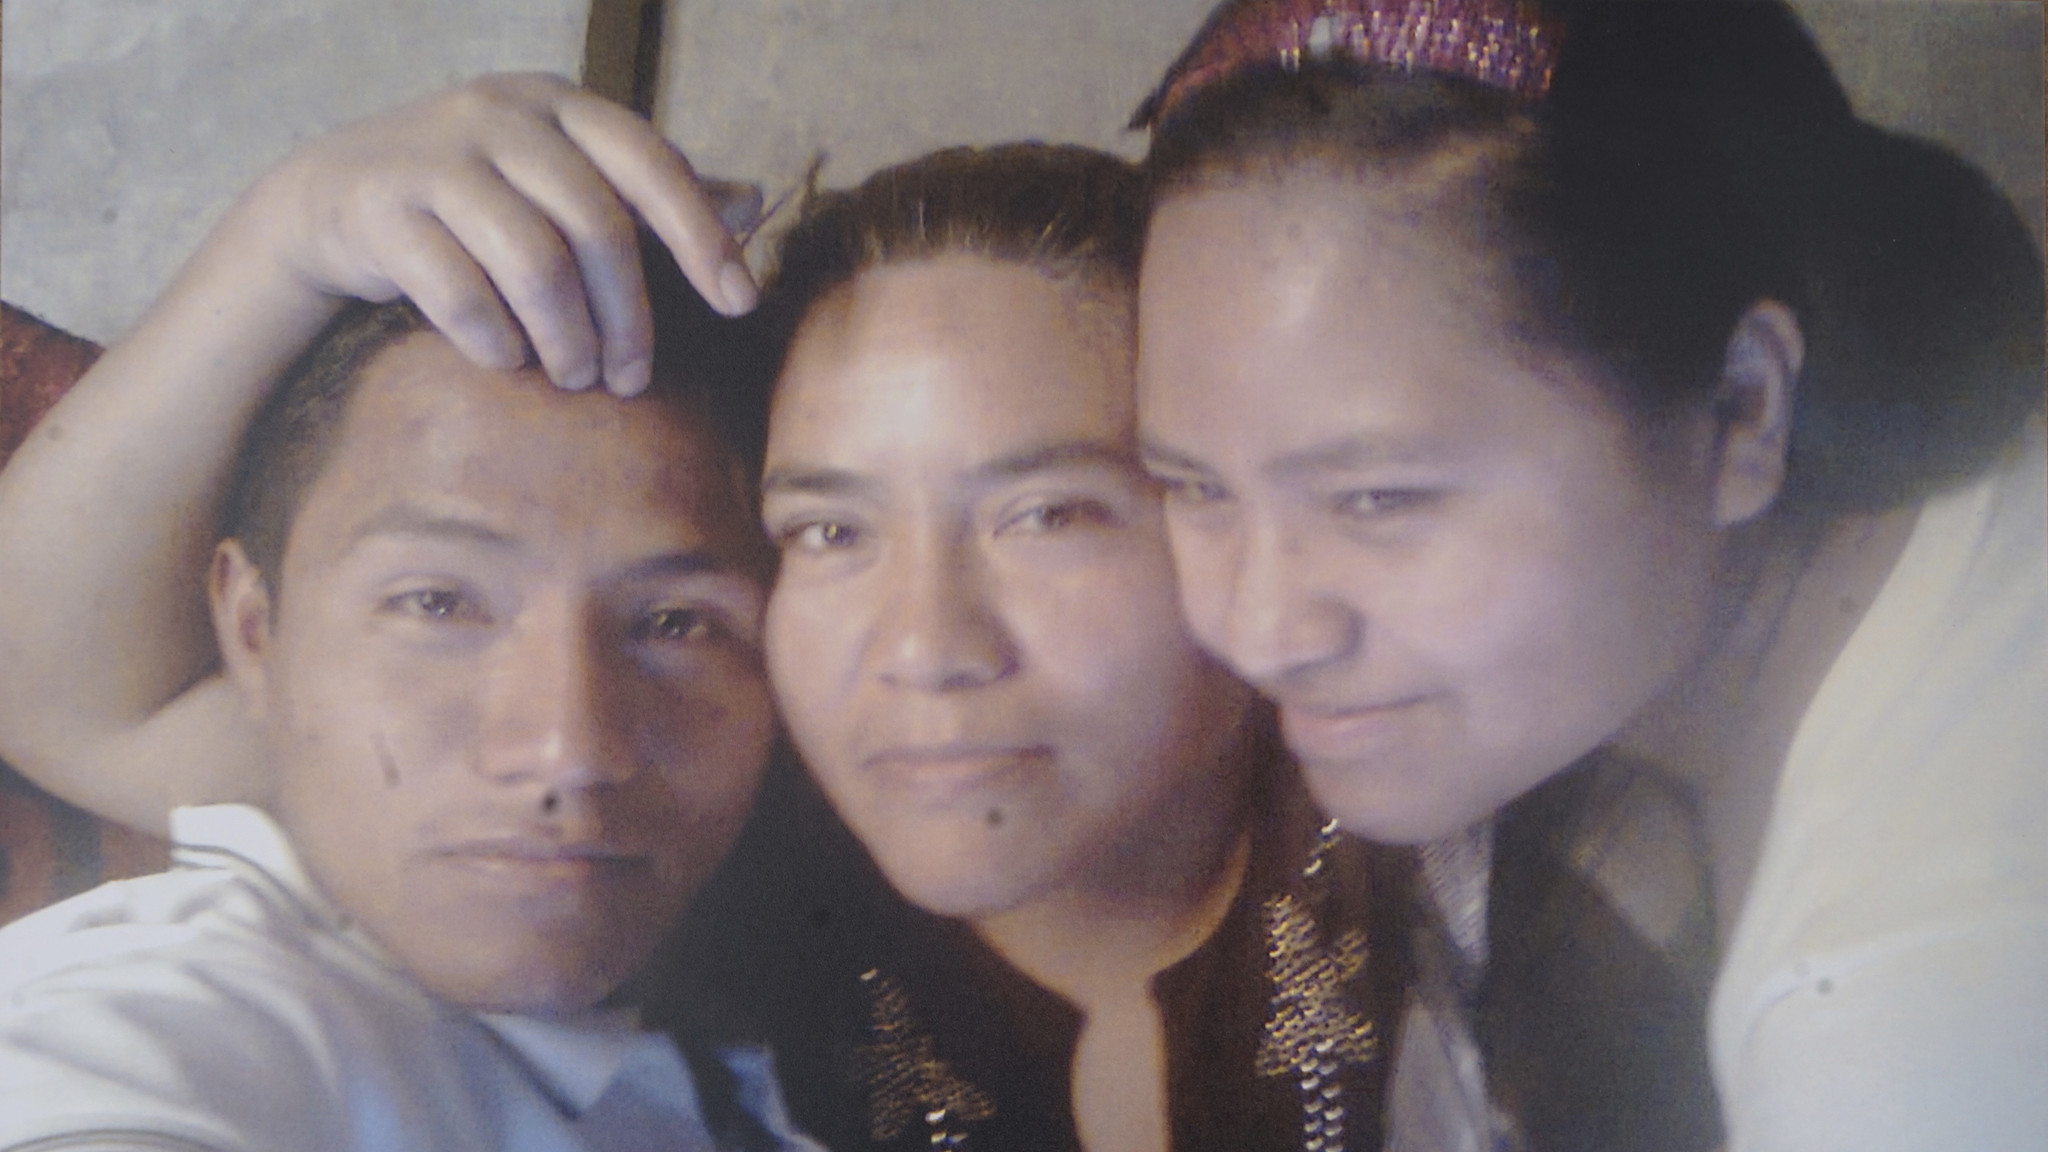 A selfie taken by Jesus Cadena Sanchez, 19, with mother Patricia Sanchez Meza and sister Maria Fernanda.